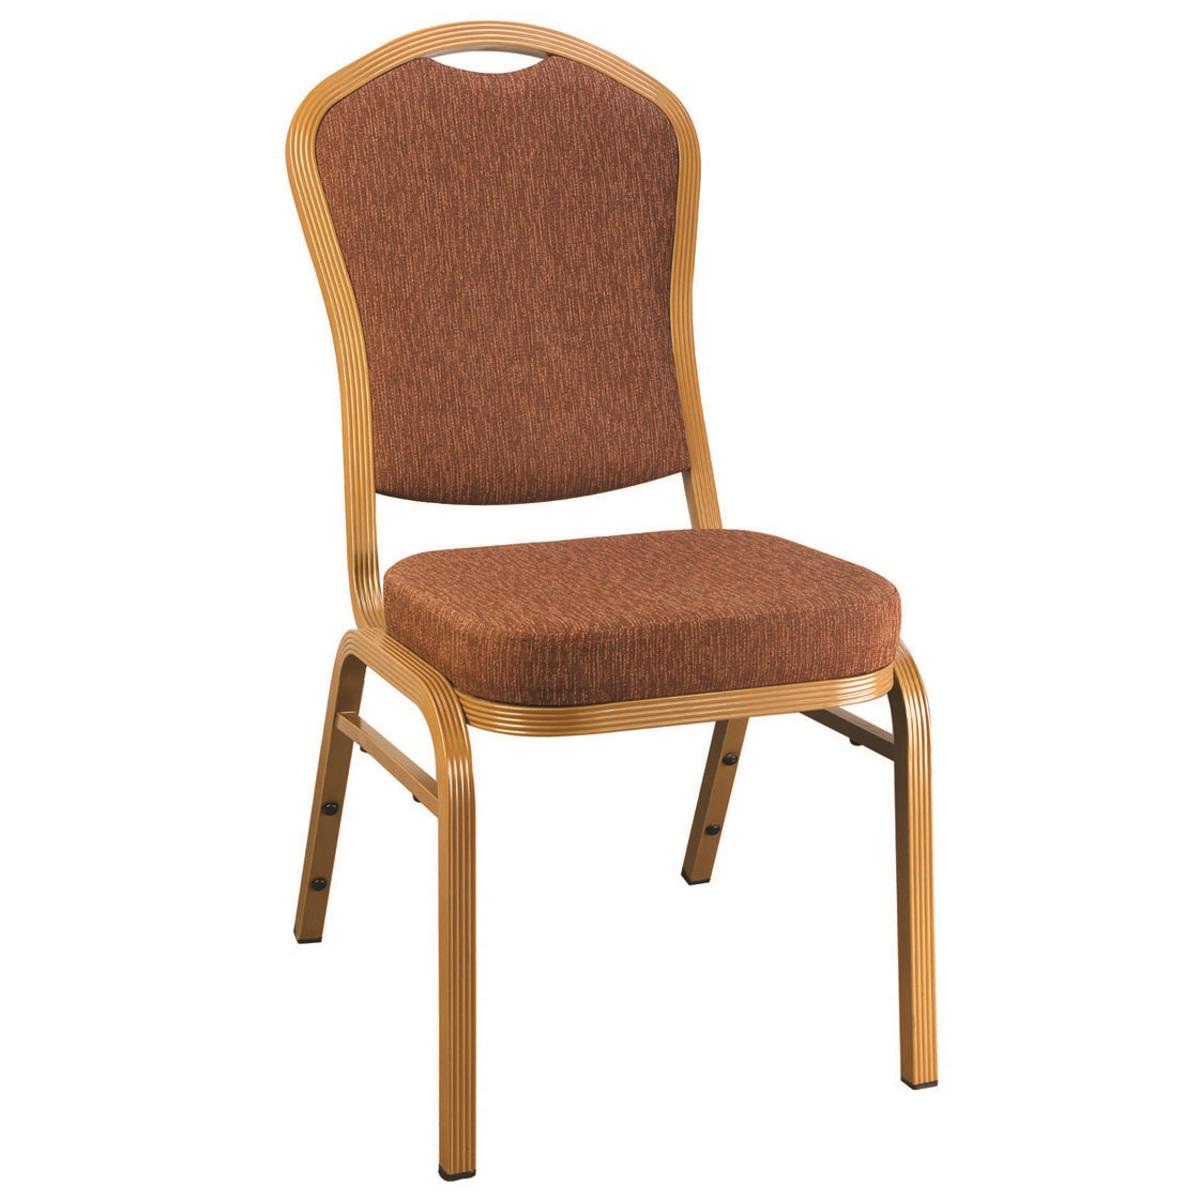 steel chair suppliers chairs that recline metal millennium seating usa restaurant